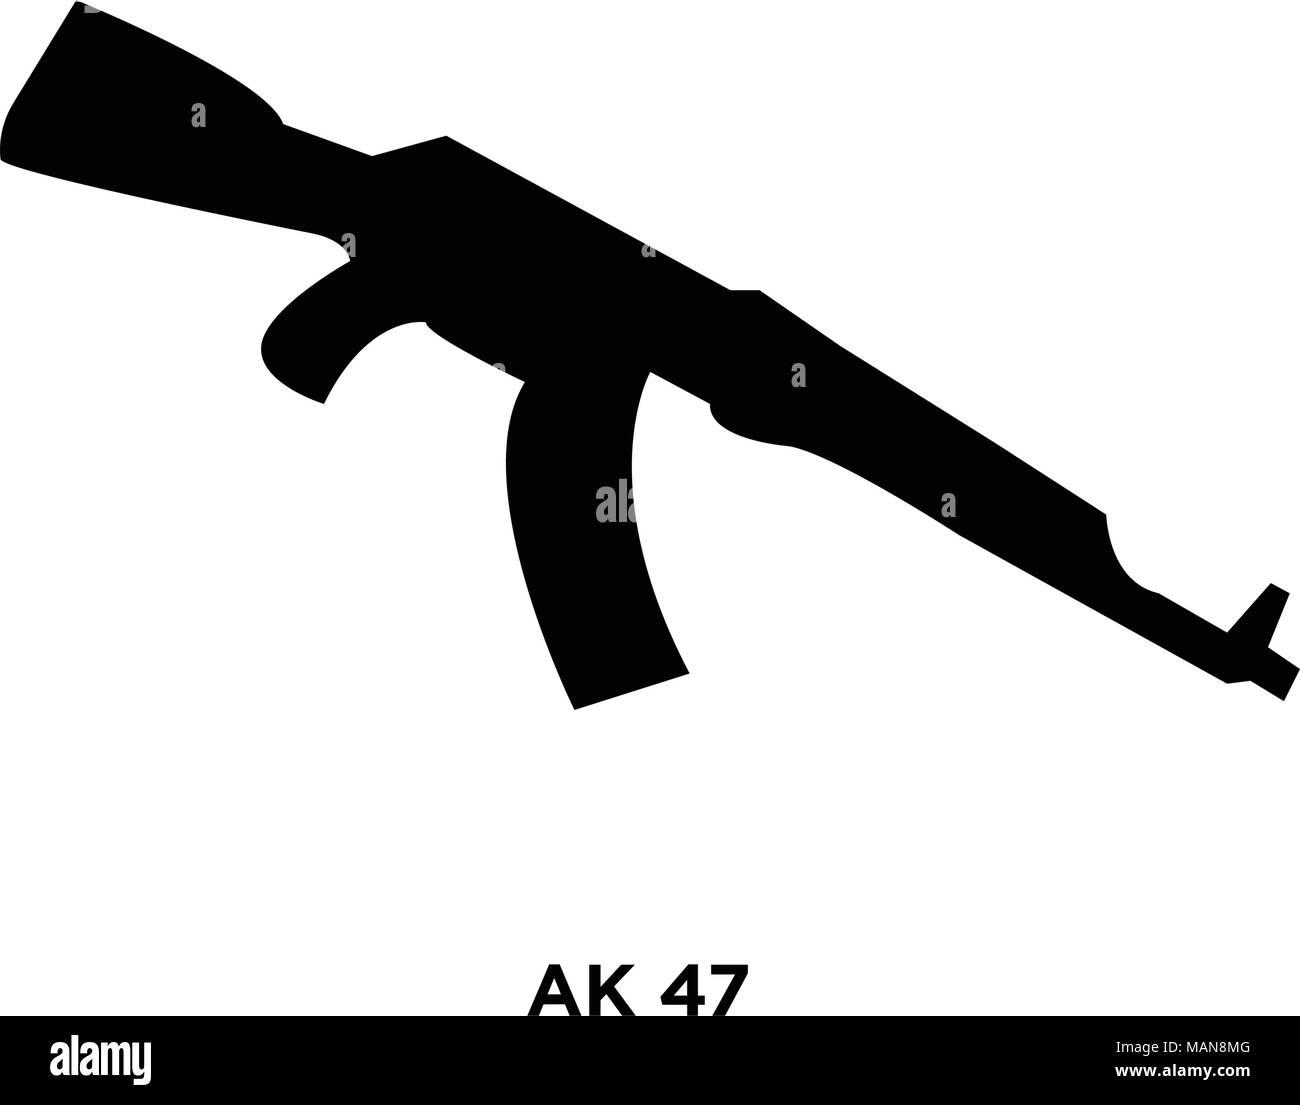 ak47 silhouette on white background vector illustration stock